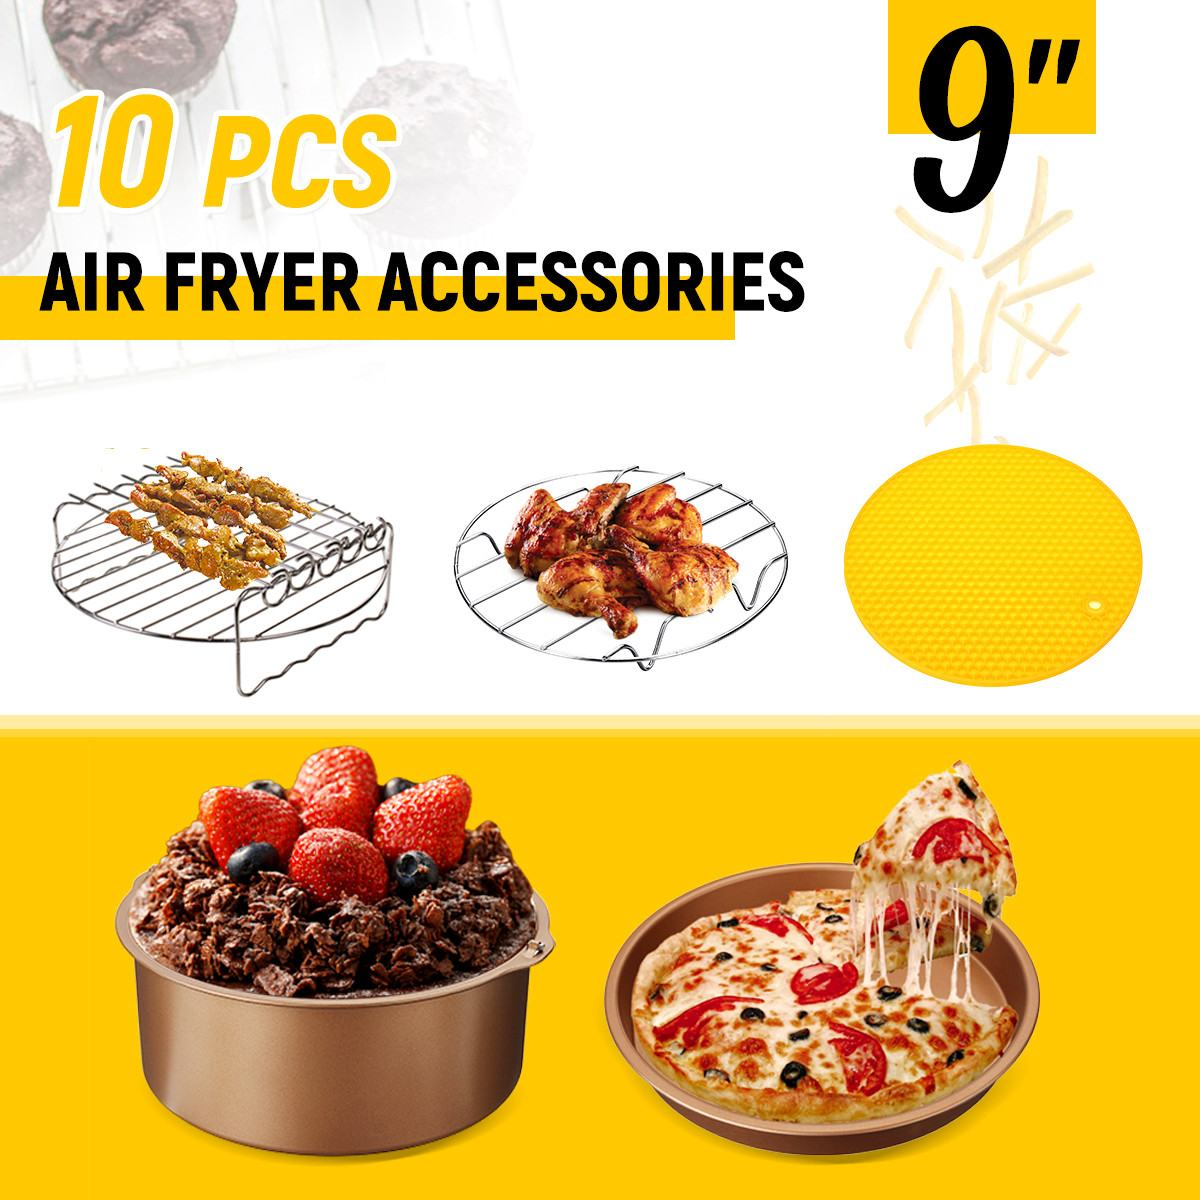 "5 Pcs 9 ""Non   stick ซิลิโคน Air Fryer อุปกรณ์เสริม Barrel เค้กพิซซ่า Pan โลหะผู้ถือ Skewer Rack สำหรับ 5.3   6.8QT Air Fryer ใหม่-ใน ชิ้นส่วนหม้อทอดไฟฟ้า จาก เครื่องใช้ในบ้าน บน title="